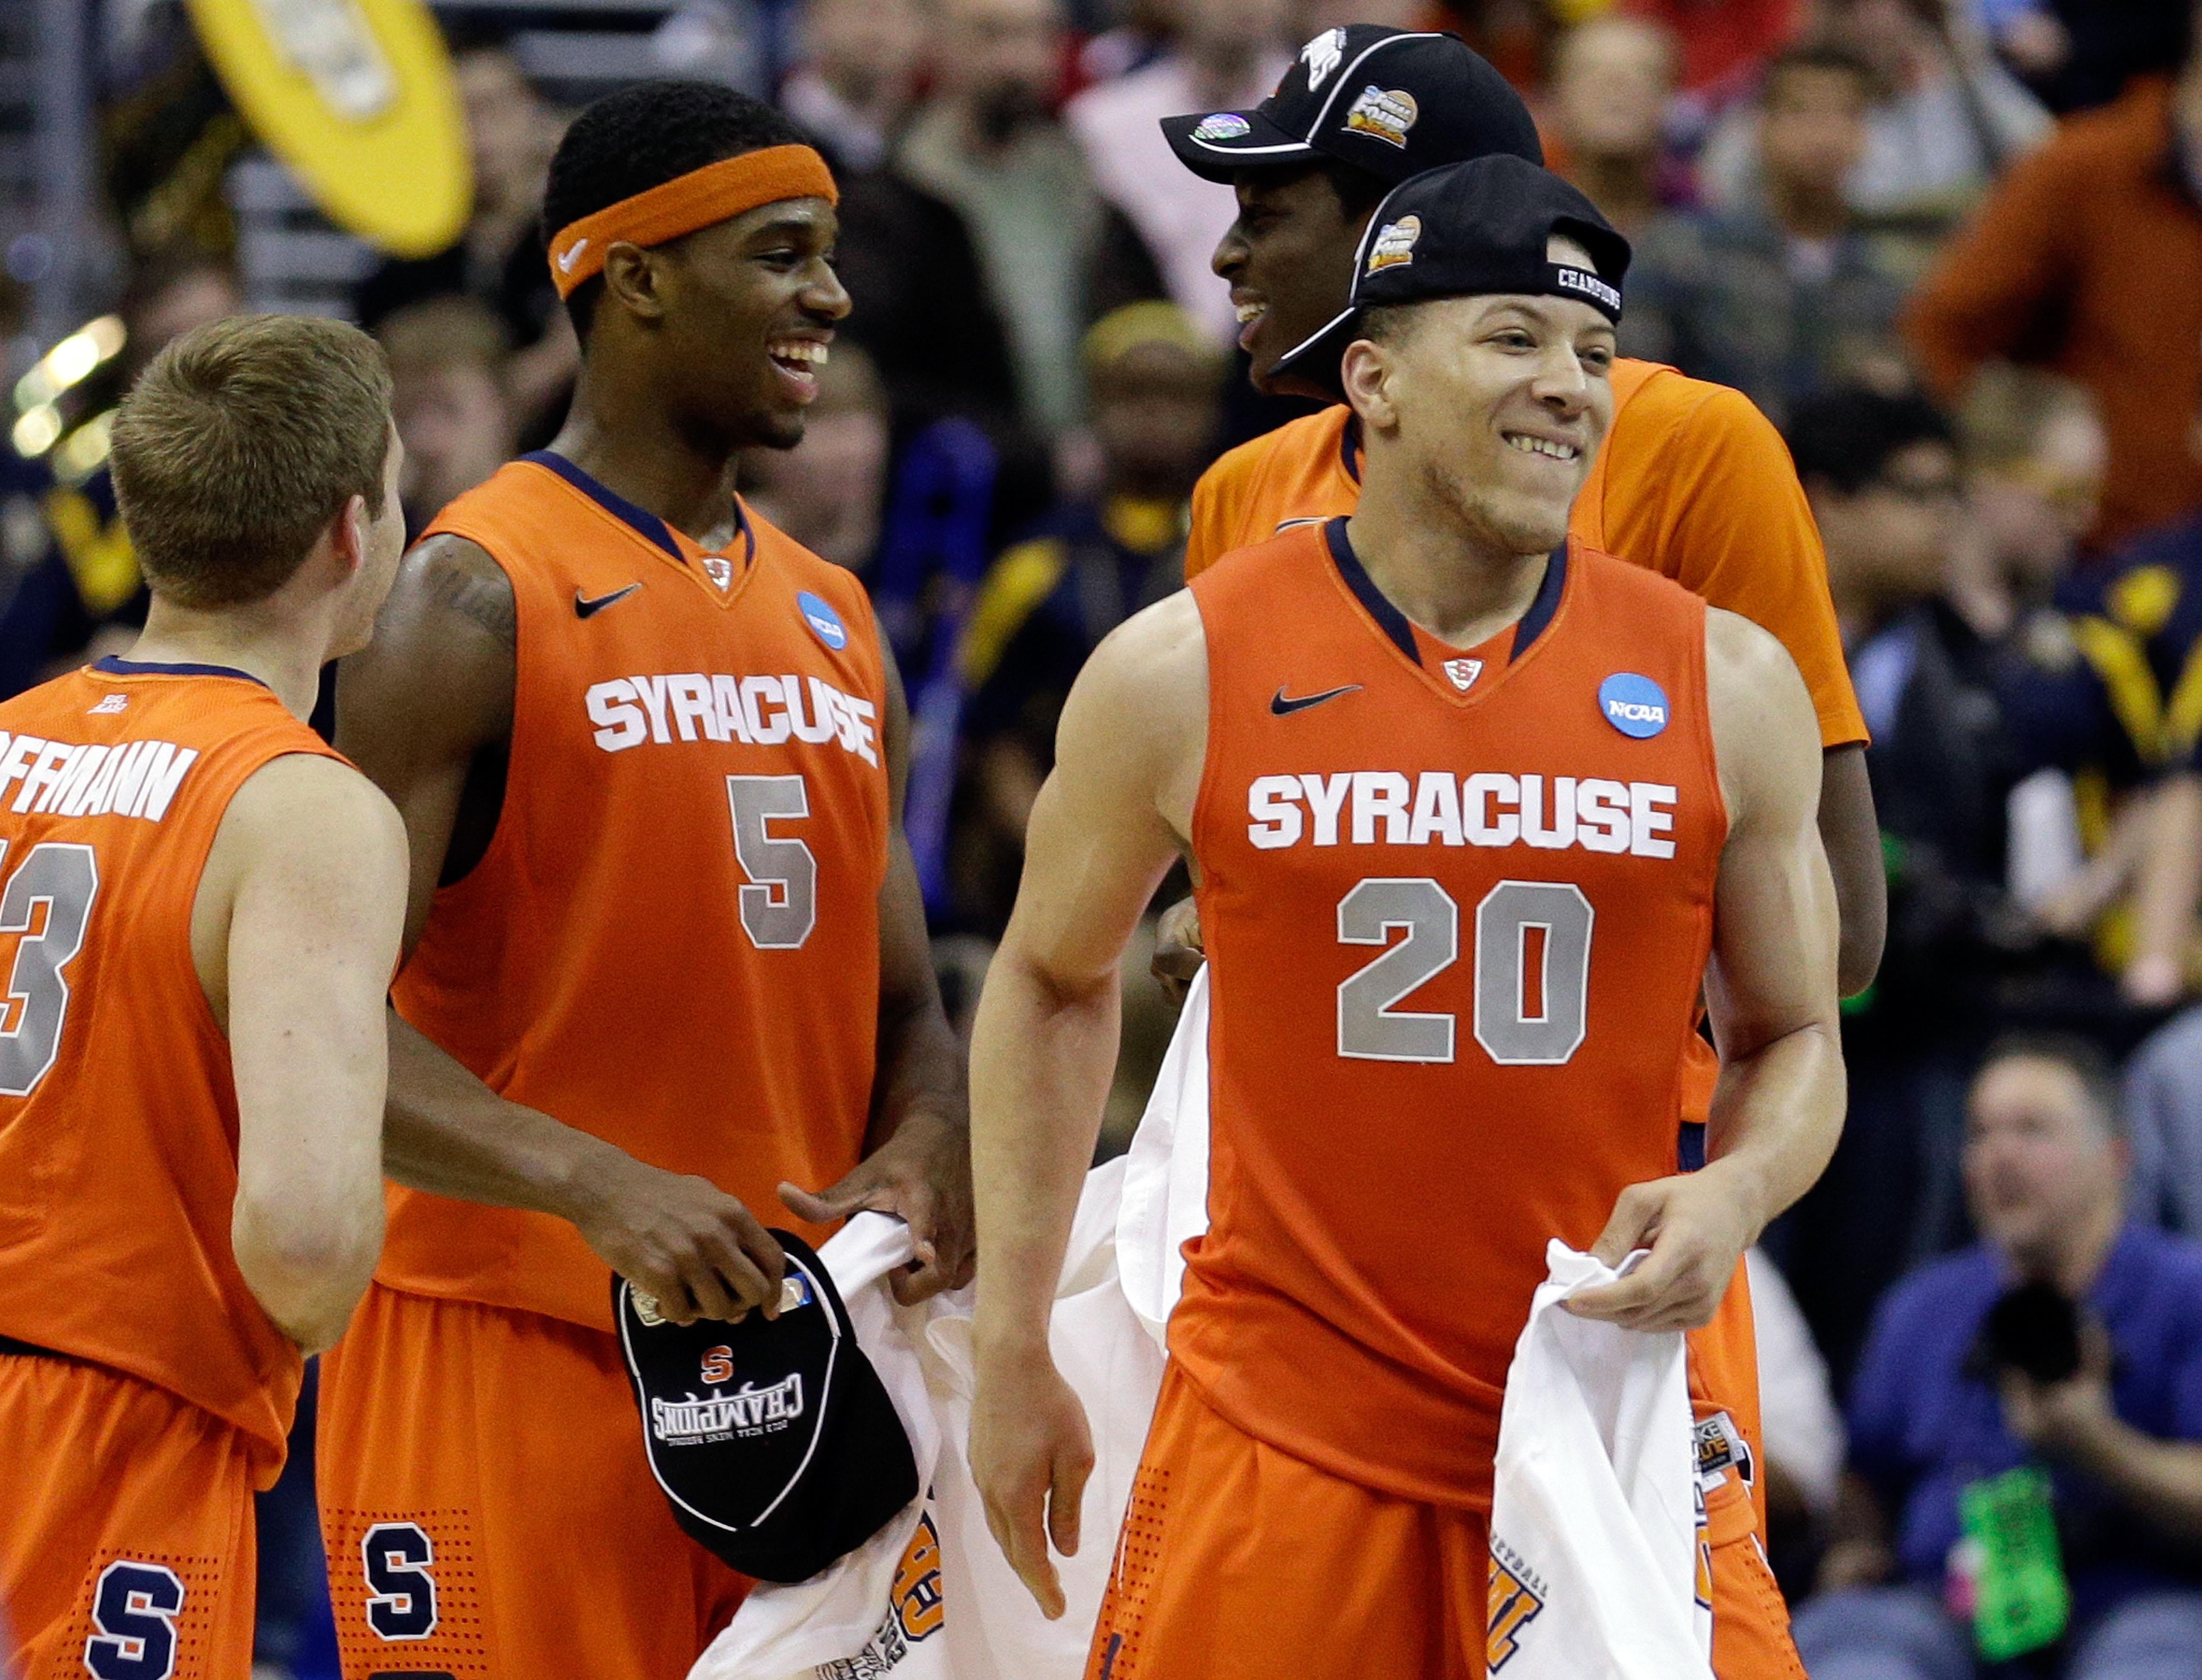 Syracuse v Marquette